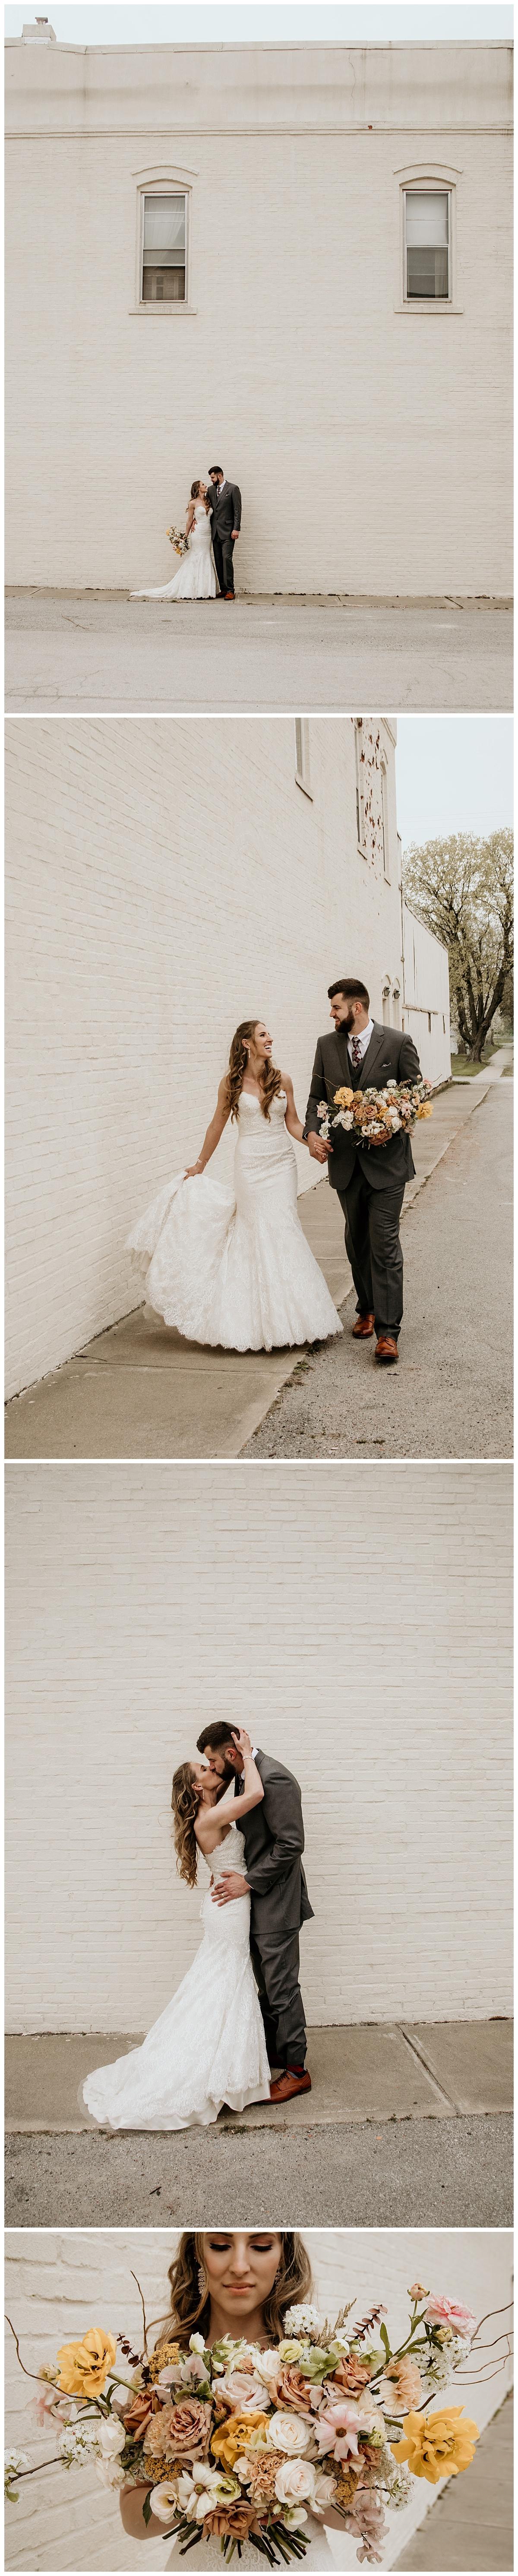 Kansas City Wedding Photography Colorado Elopement Photography